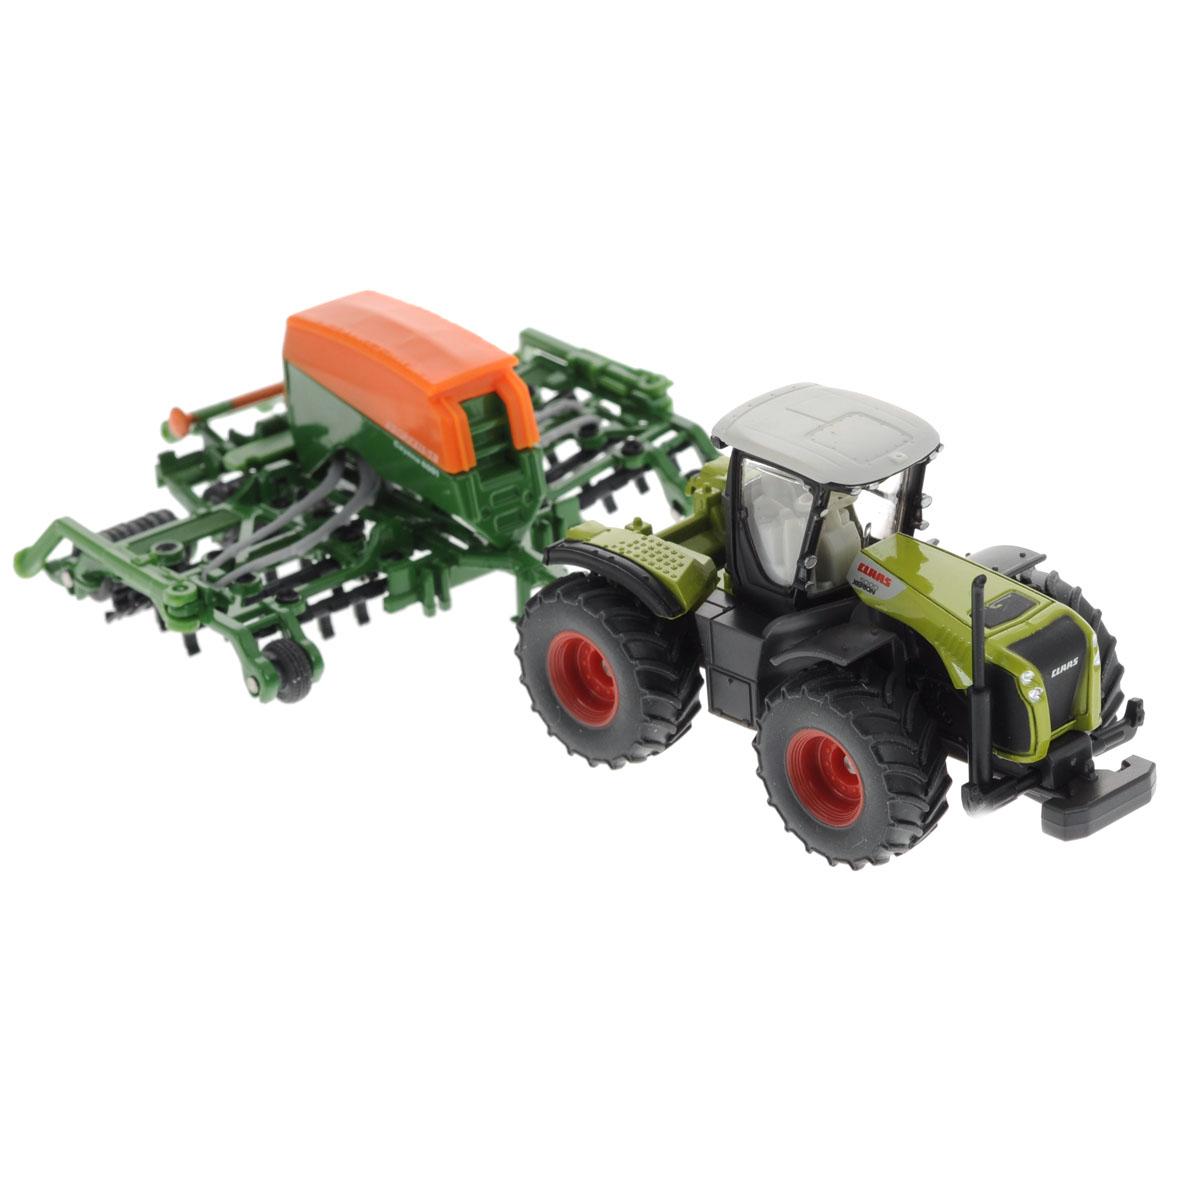 Siku Трактор Claas Xerion с сеялкой Amazone Cayenna 6001 siku трактор john deere с пресс подборщиком